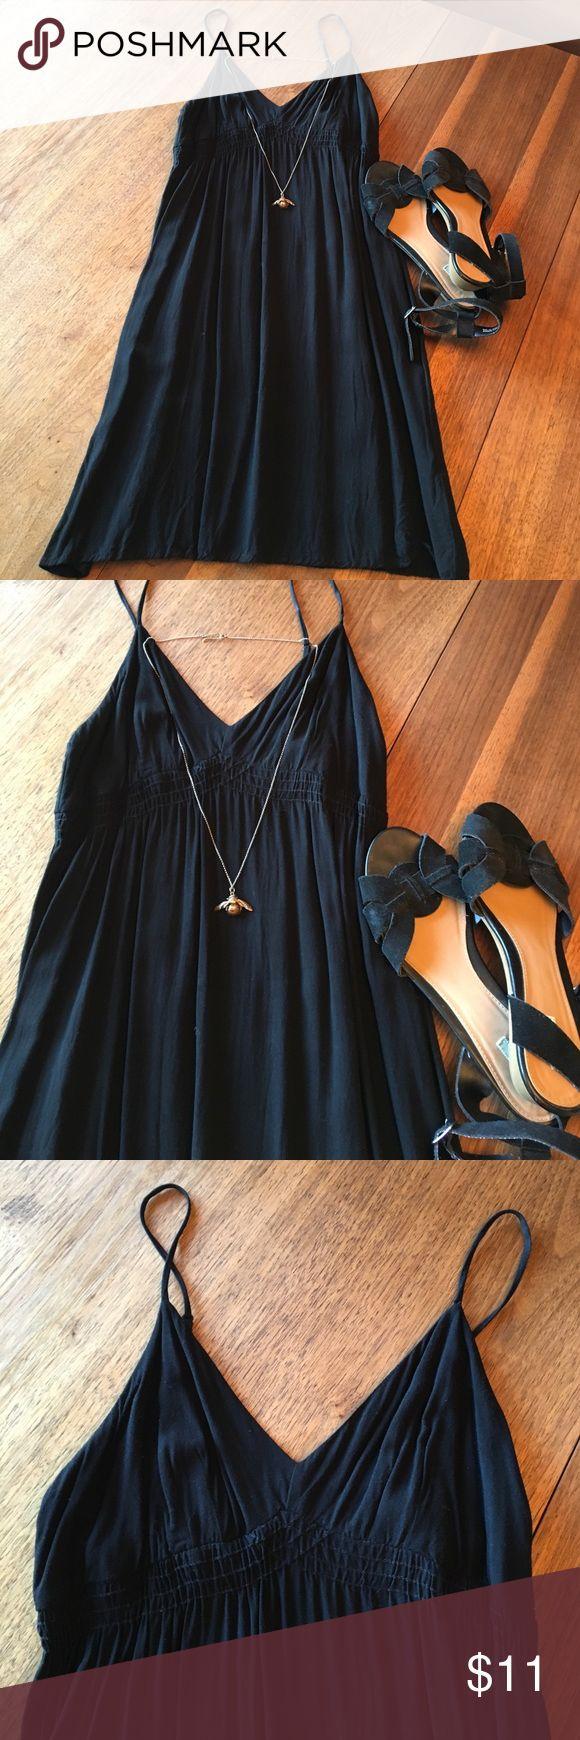 Black Spaghetti Strap Sun Dress Black Adjustable Spaghetti Strap Sun Dress. Simple little black dress that's great for summer. Mossimo Supply Co. Dresses